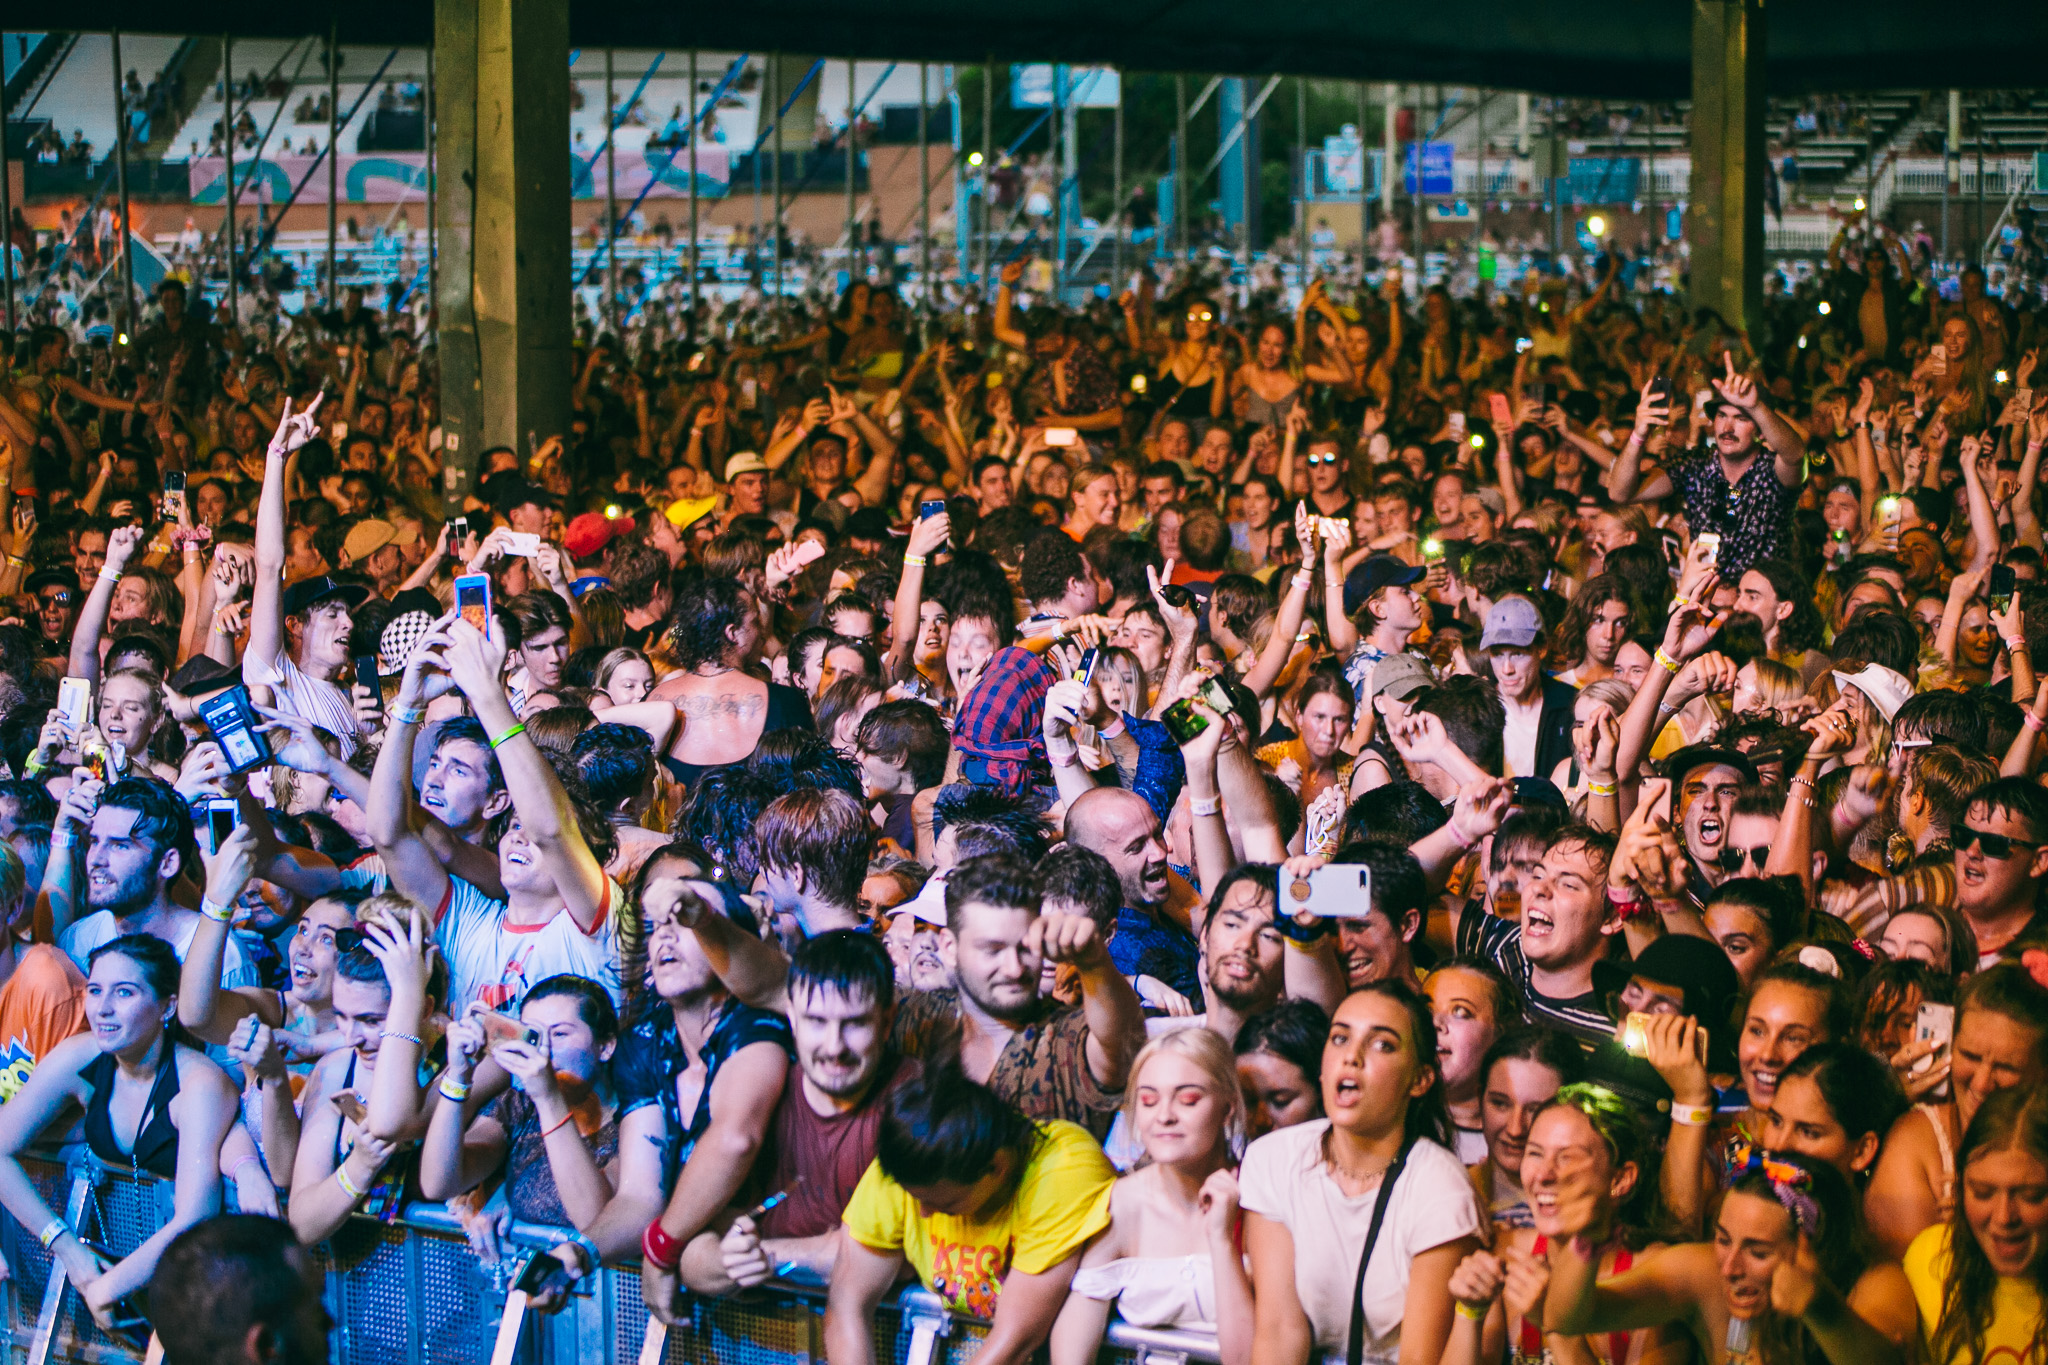 Punters - Crowds - Vendors_Laneway Brisbane 2019_Bianca Holderness-29.jpg